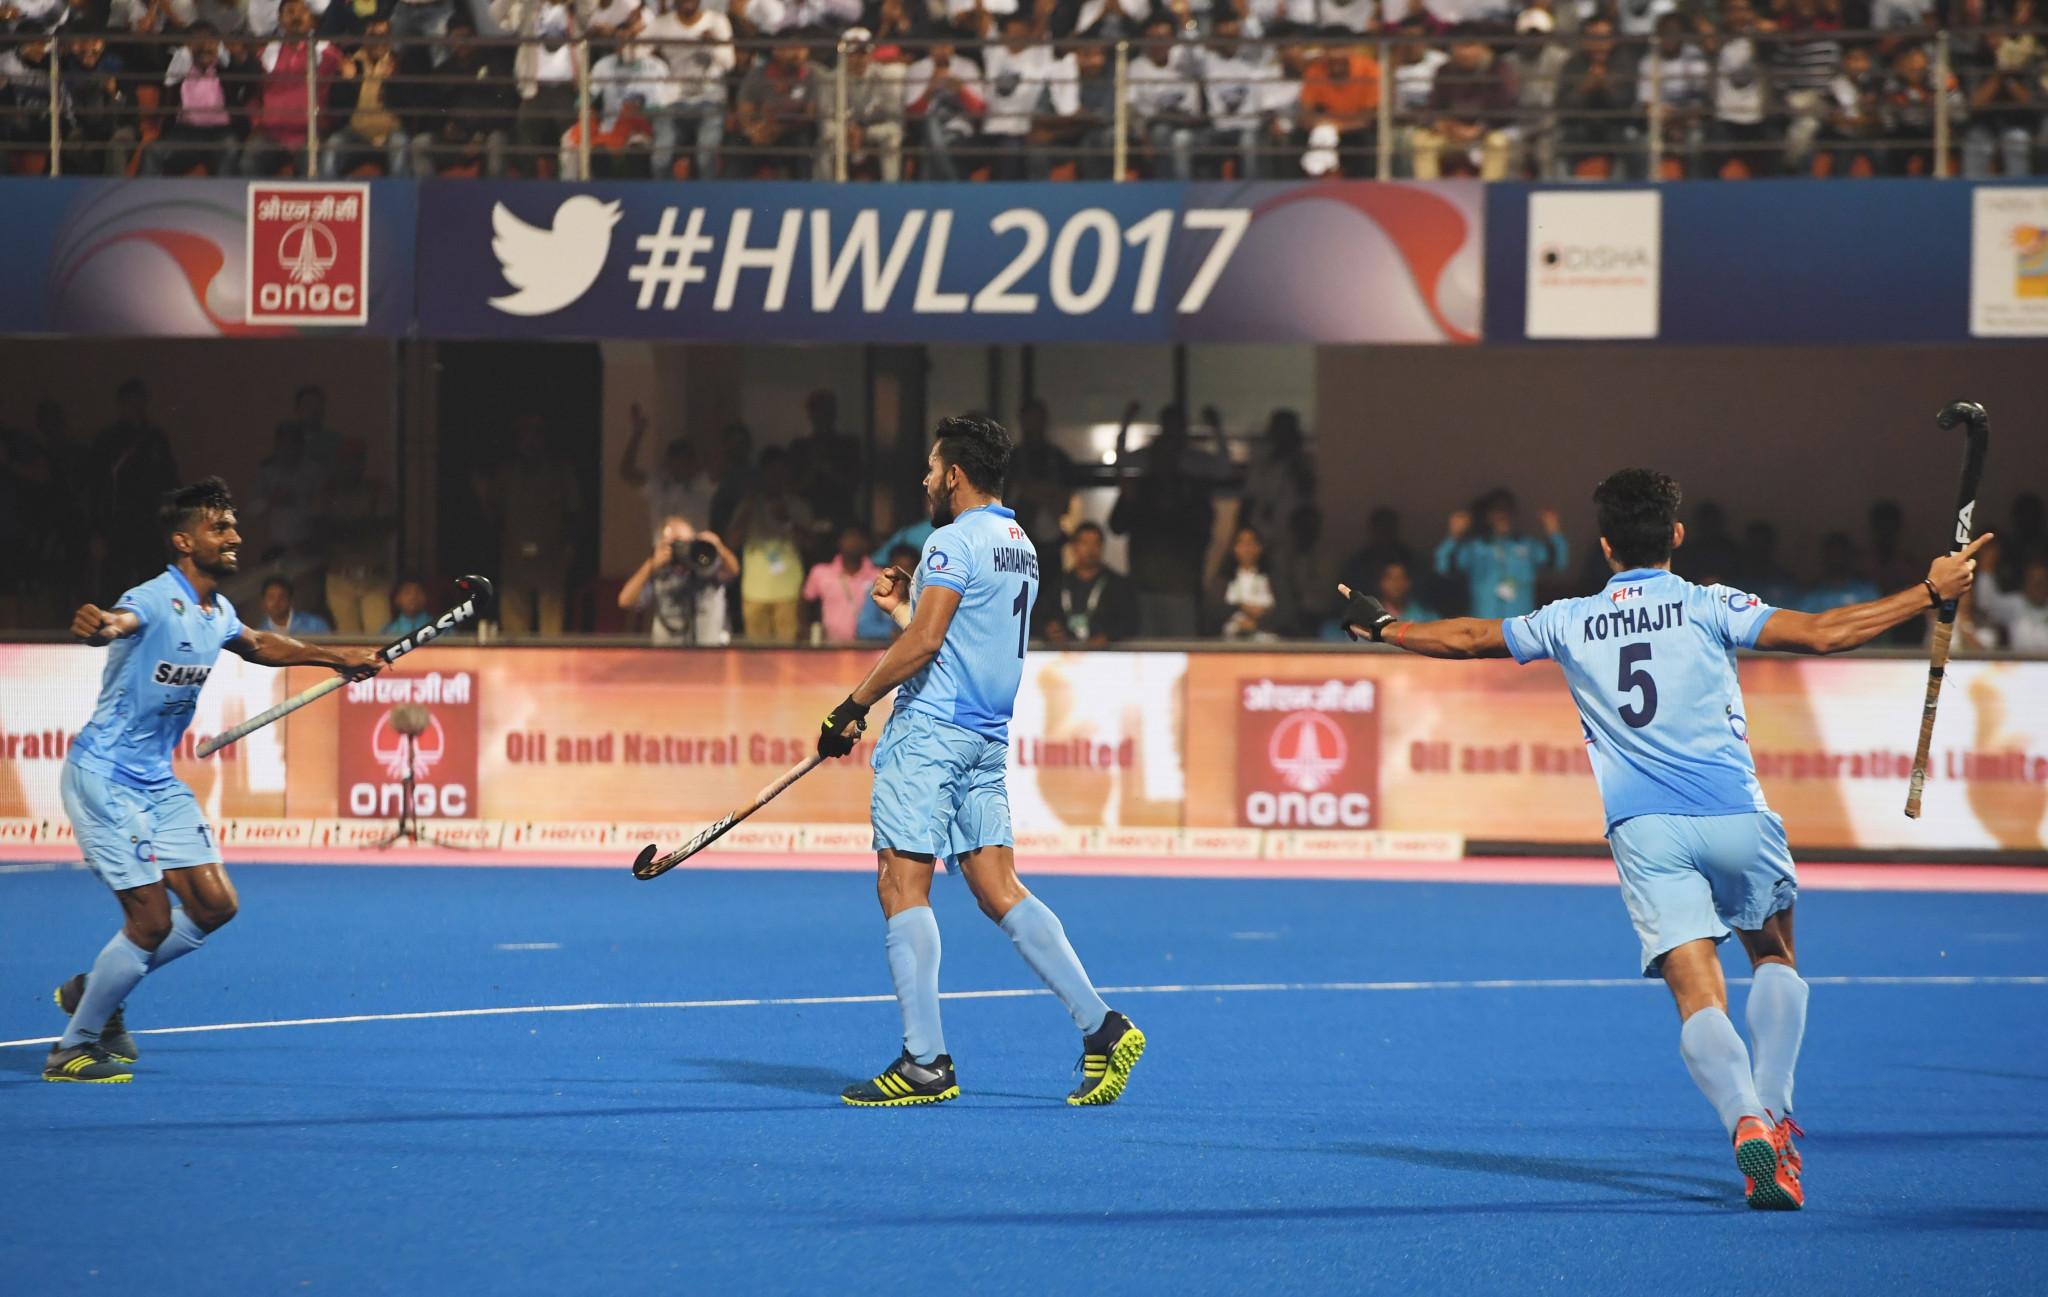 Harmanpreet Singh Centre Scored The Winning Goal As India Beat Germany 2 1